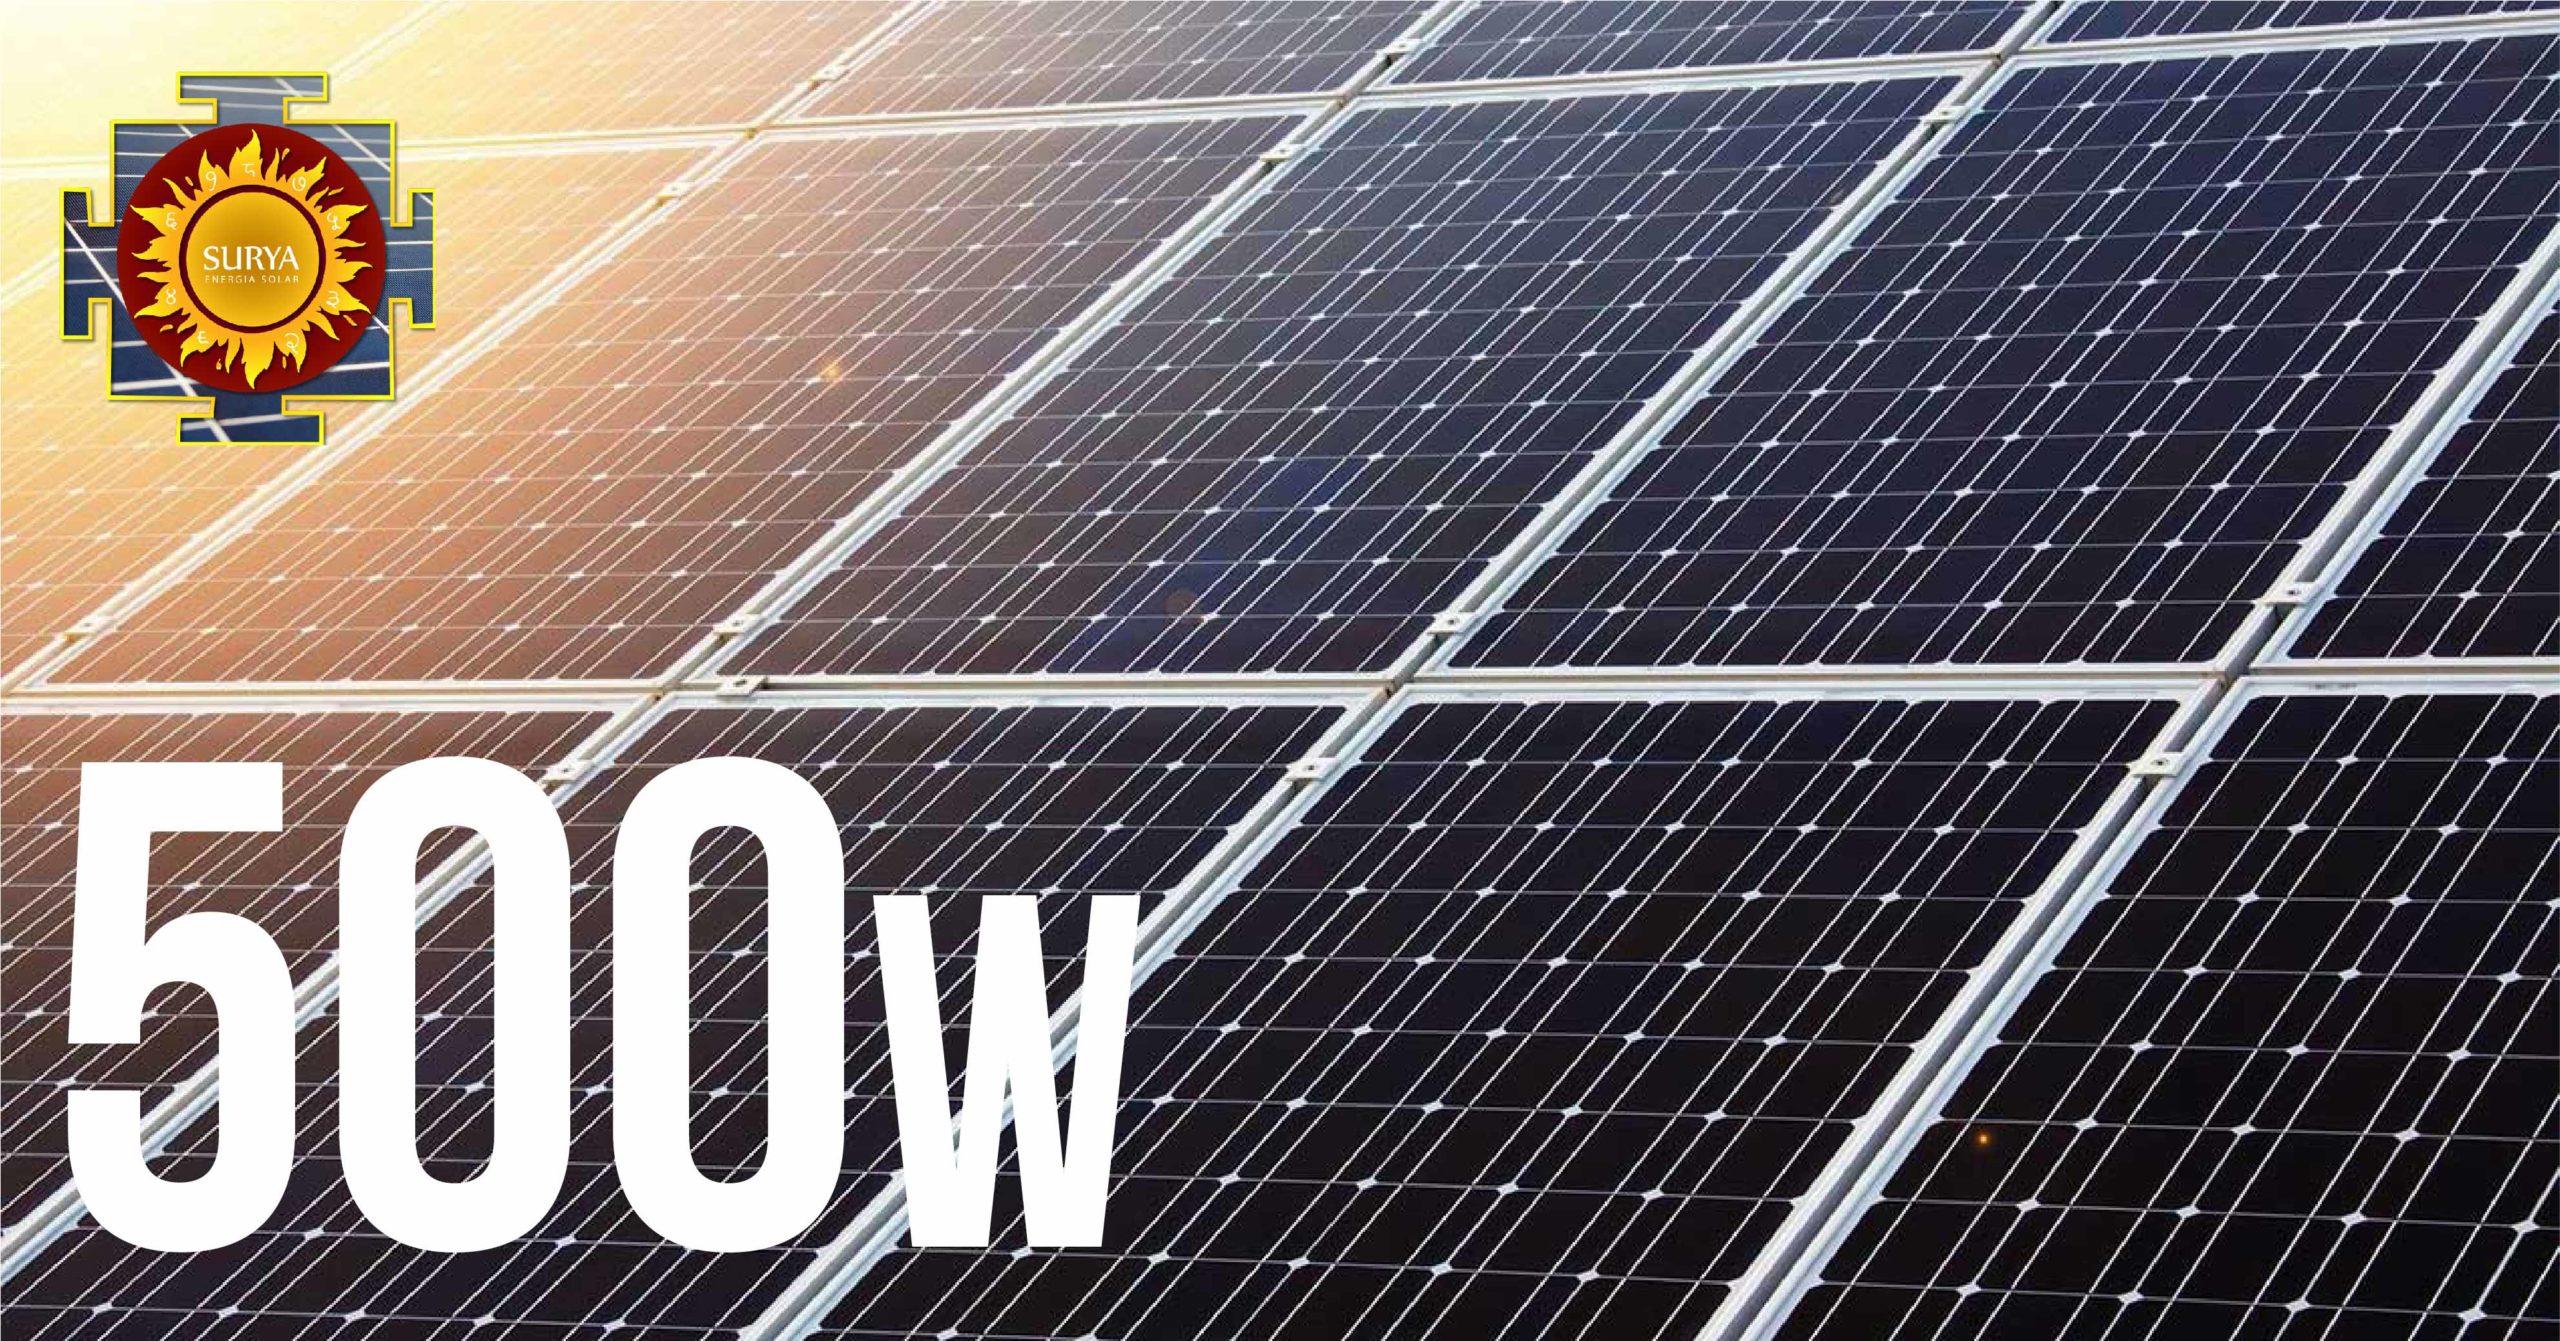 panel-solar-01-1-scaled.jpg